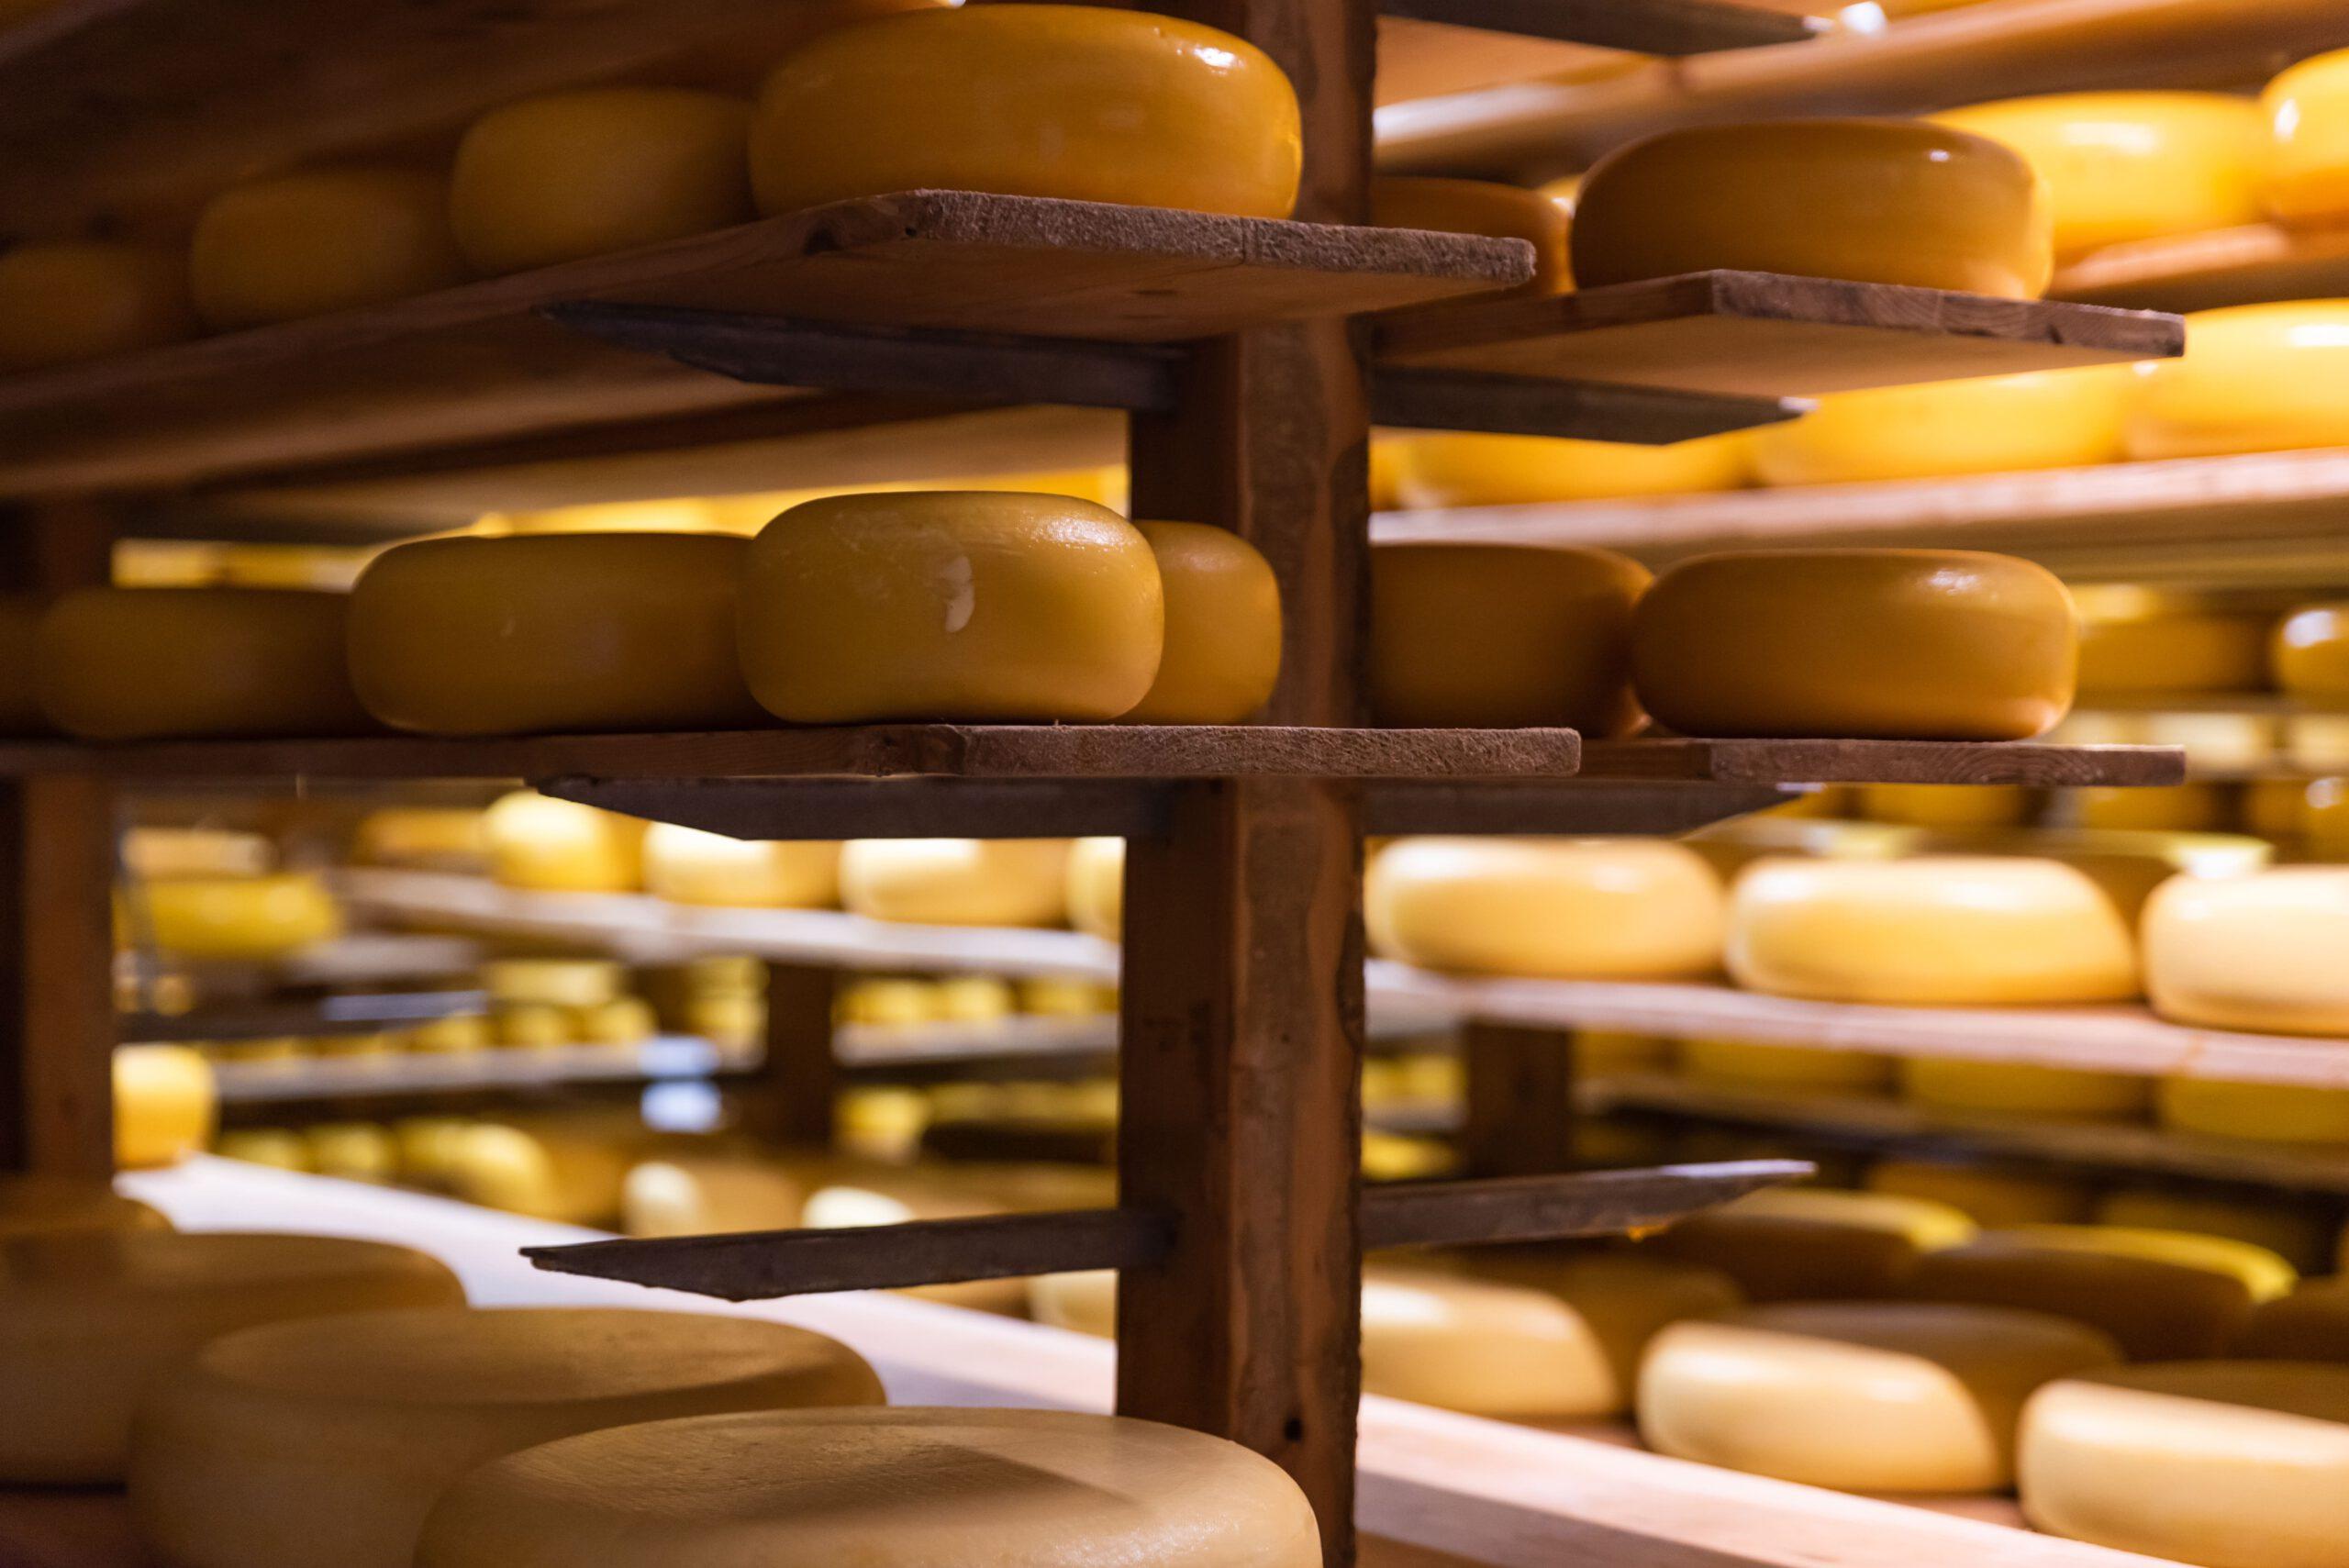 Kaas van de boerderij | Kaasboerderij Speksnijder | Online kaaswinkel